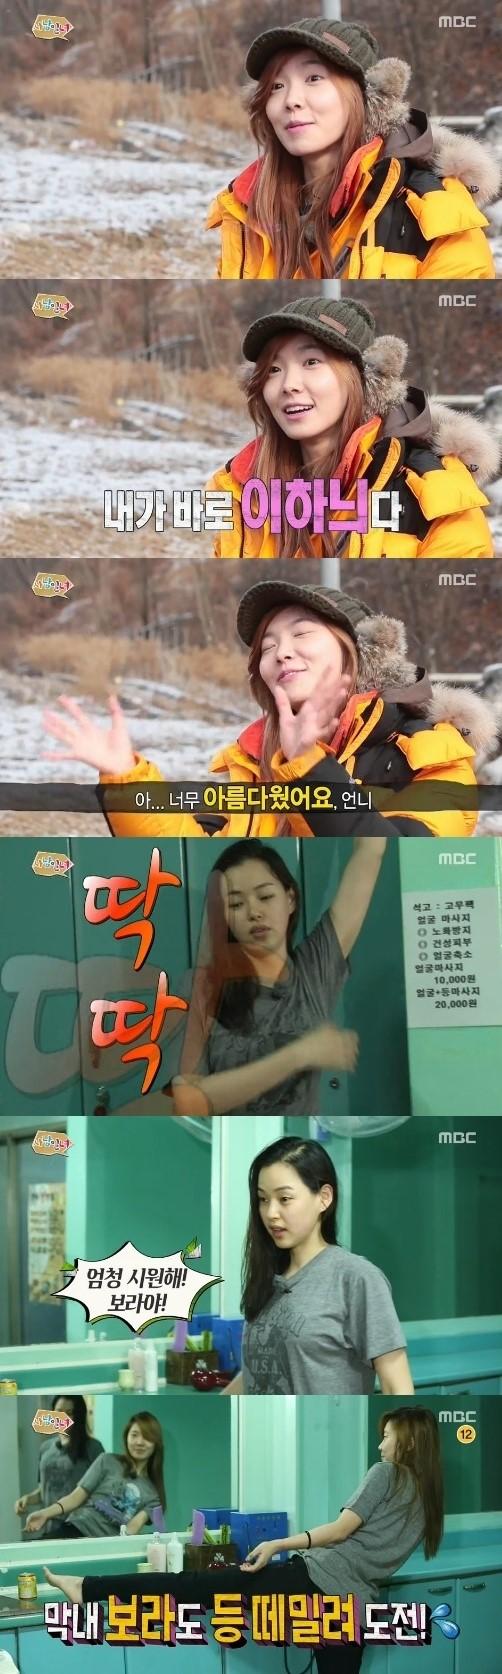 shin bora praises honey lee for her quotmiss koreaquot figure